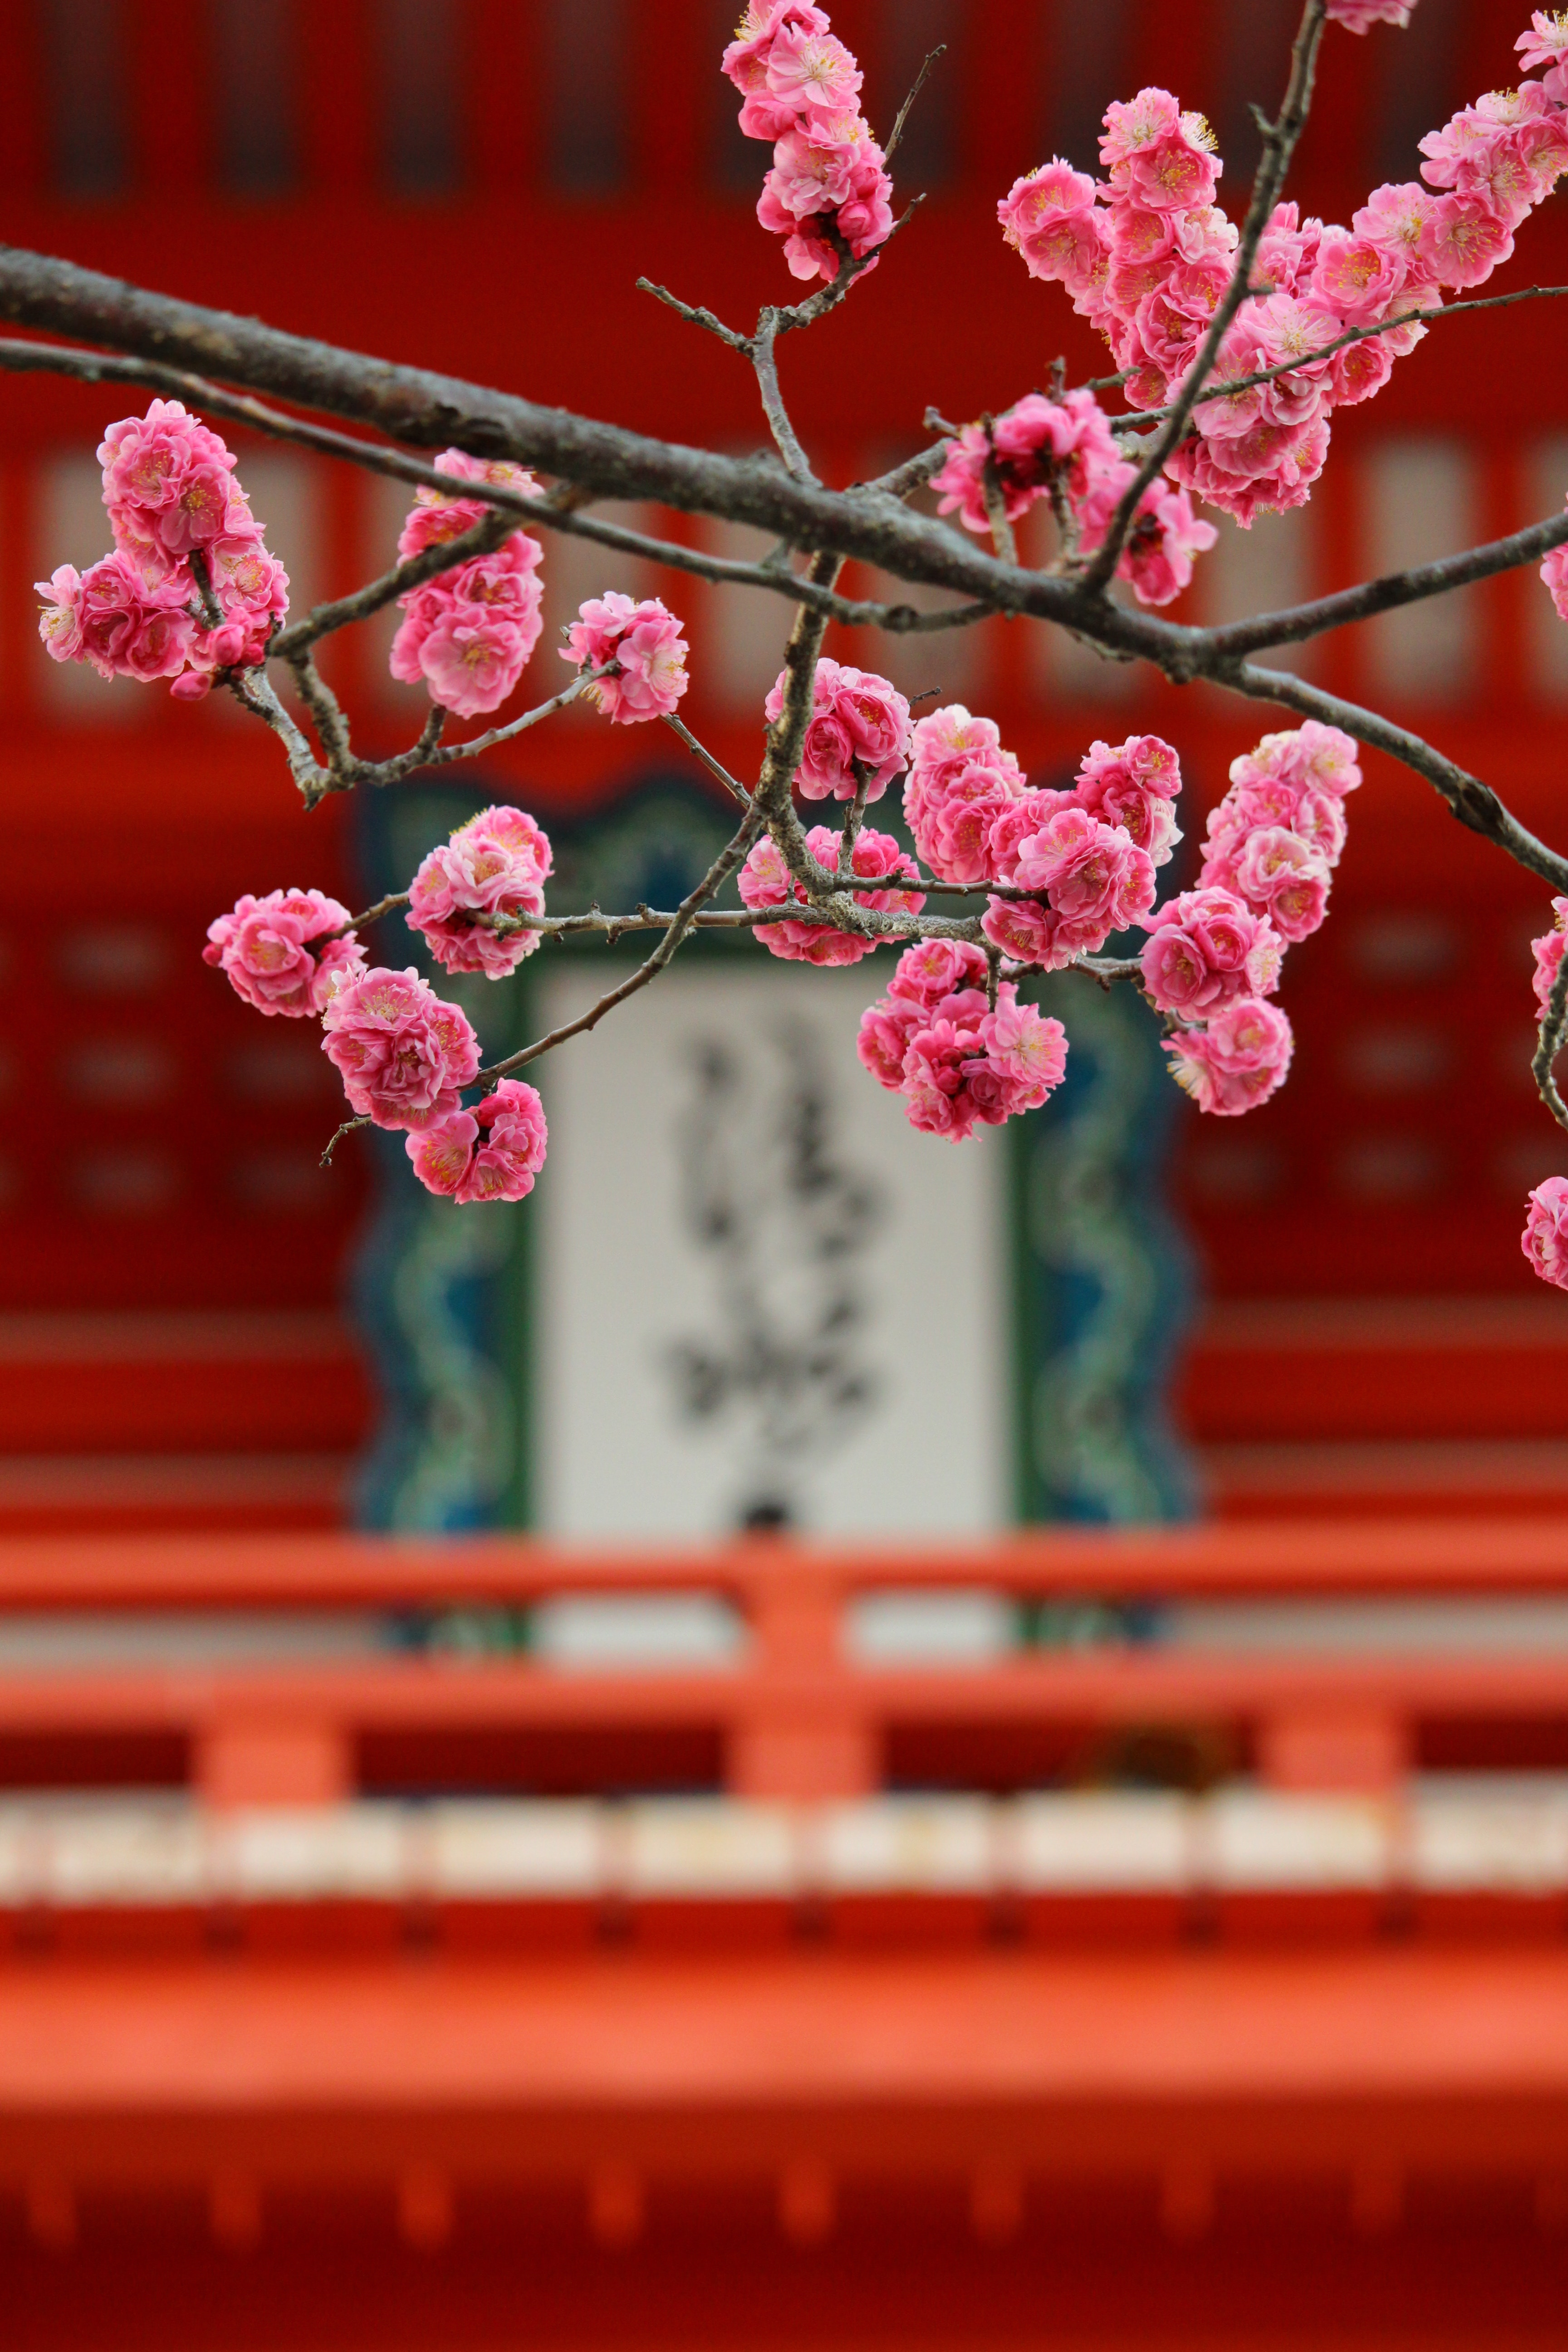 73723 Screensavers and Wallpapers Sakura for phone. Download Flowers, Pink, Sakura, Blur, Smooth, Bloom, Flowering pictures for free